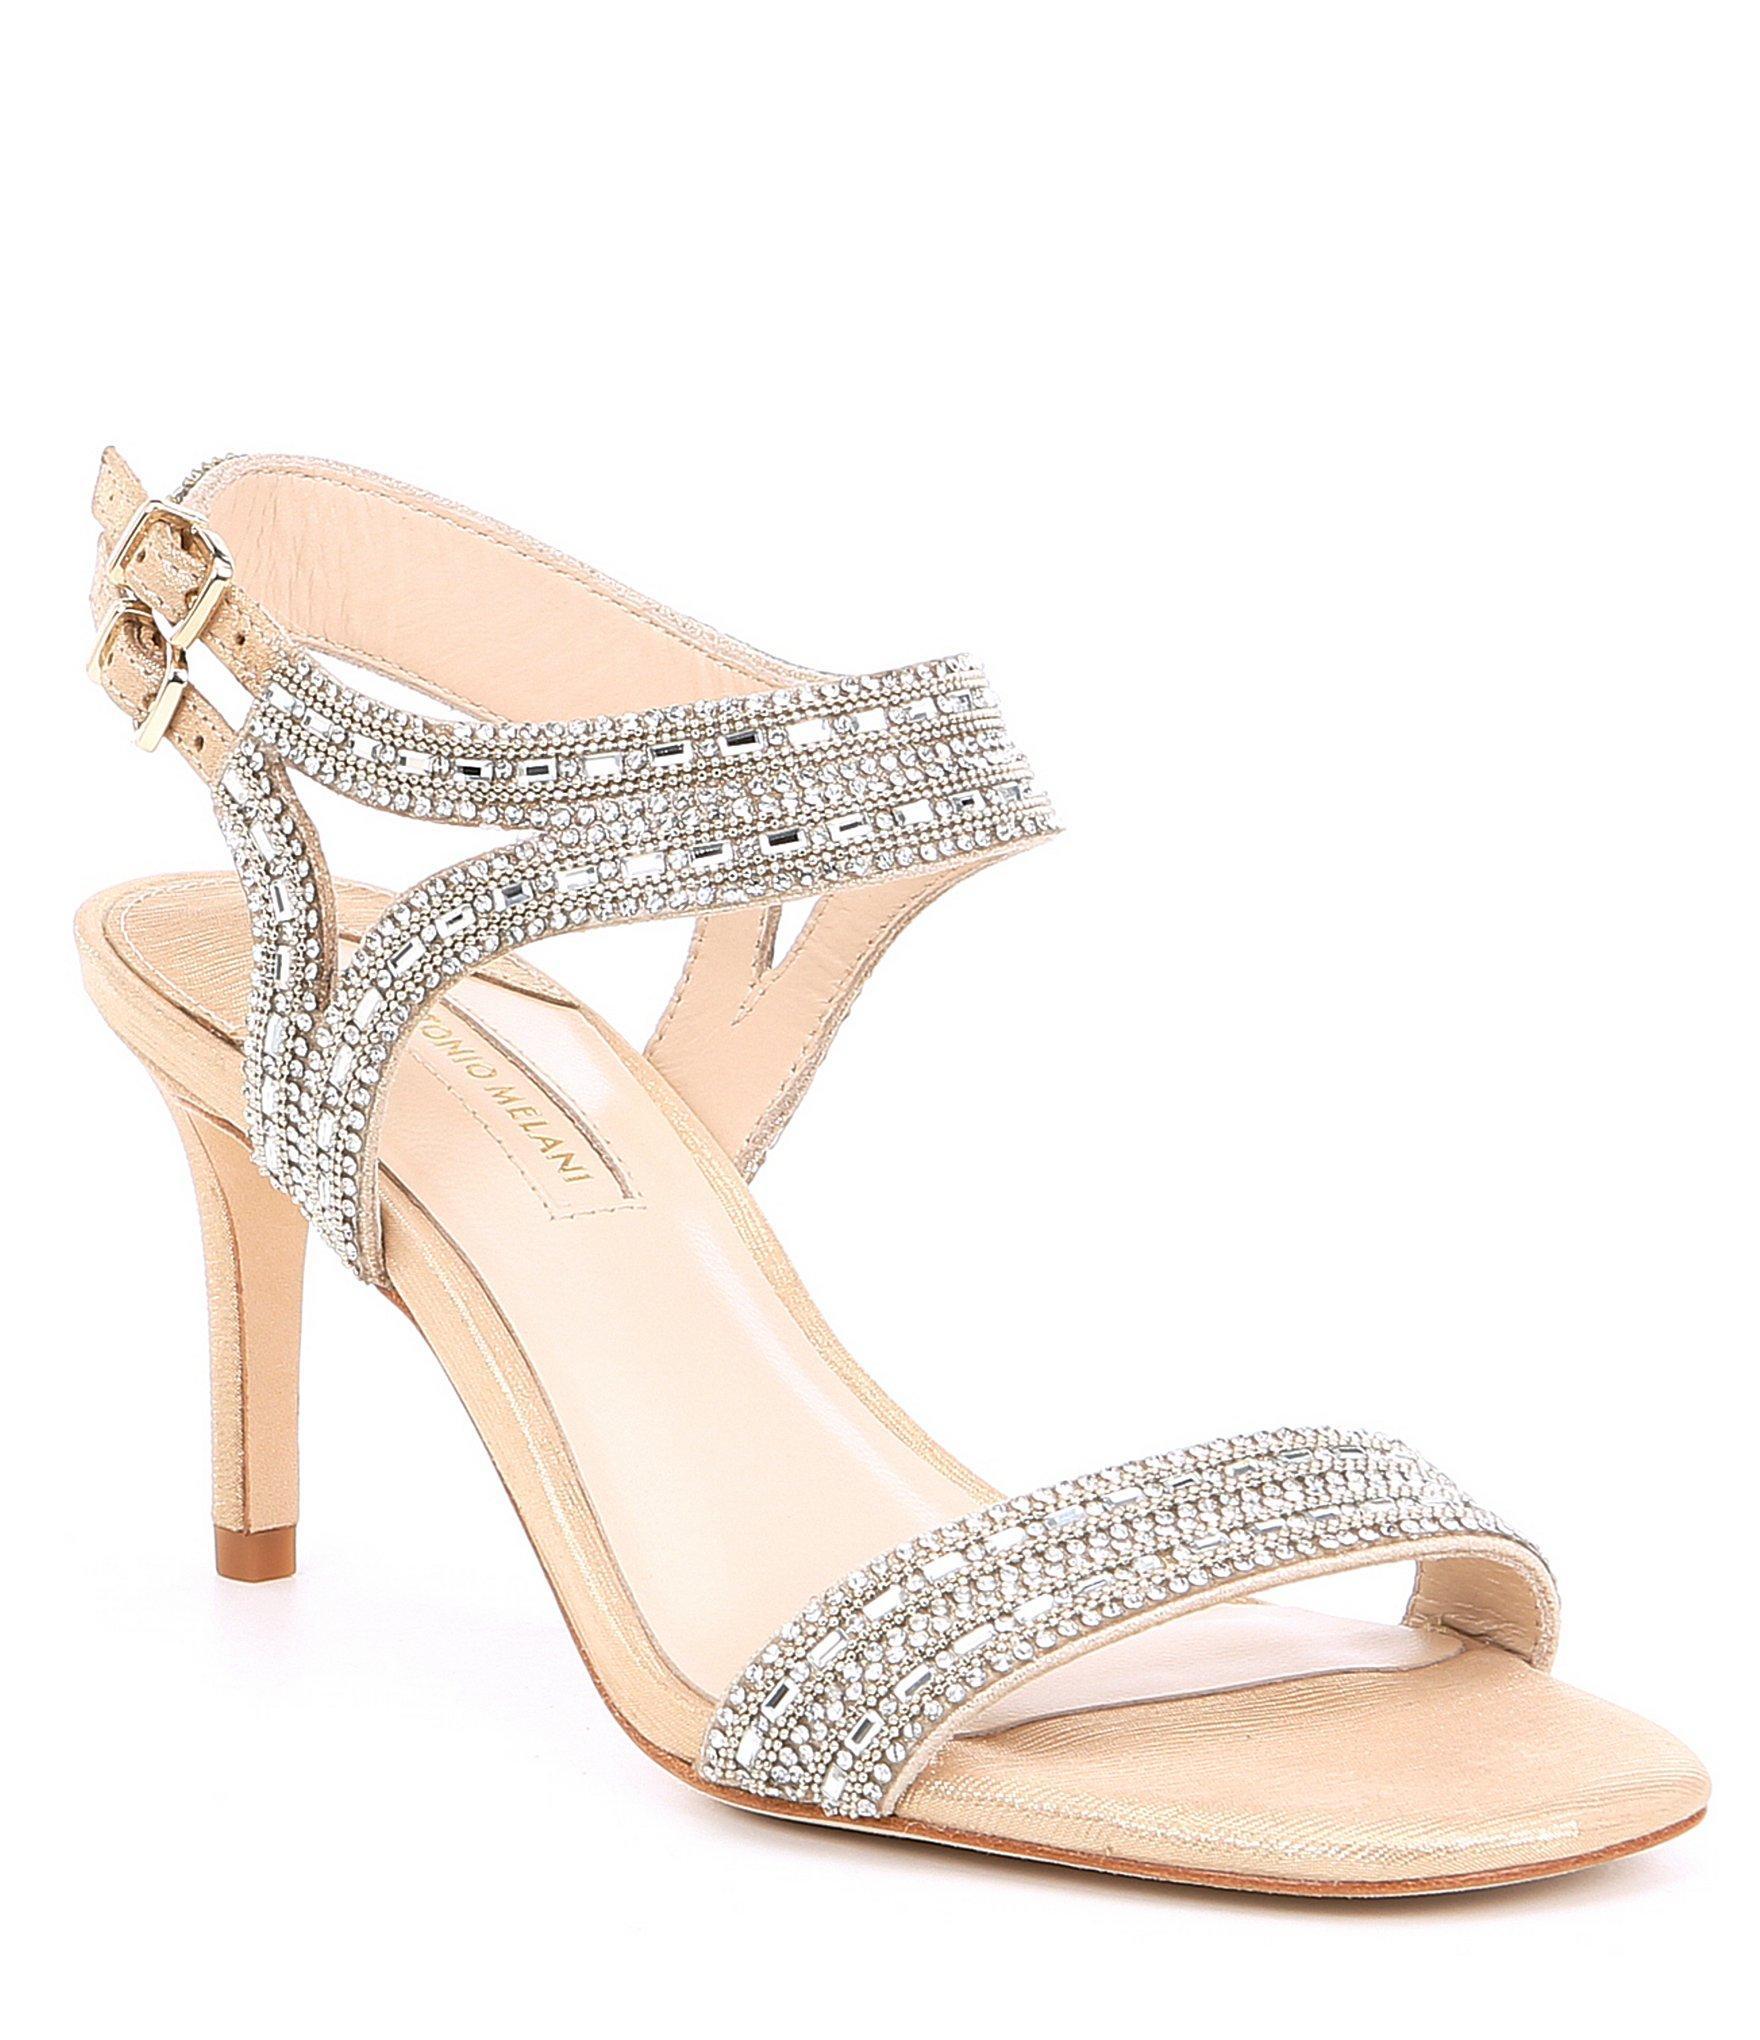 a48164547 Lyst - Antonio Melani Haelee Rhinestone Dress Sandals